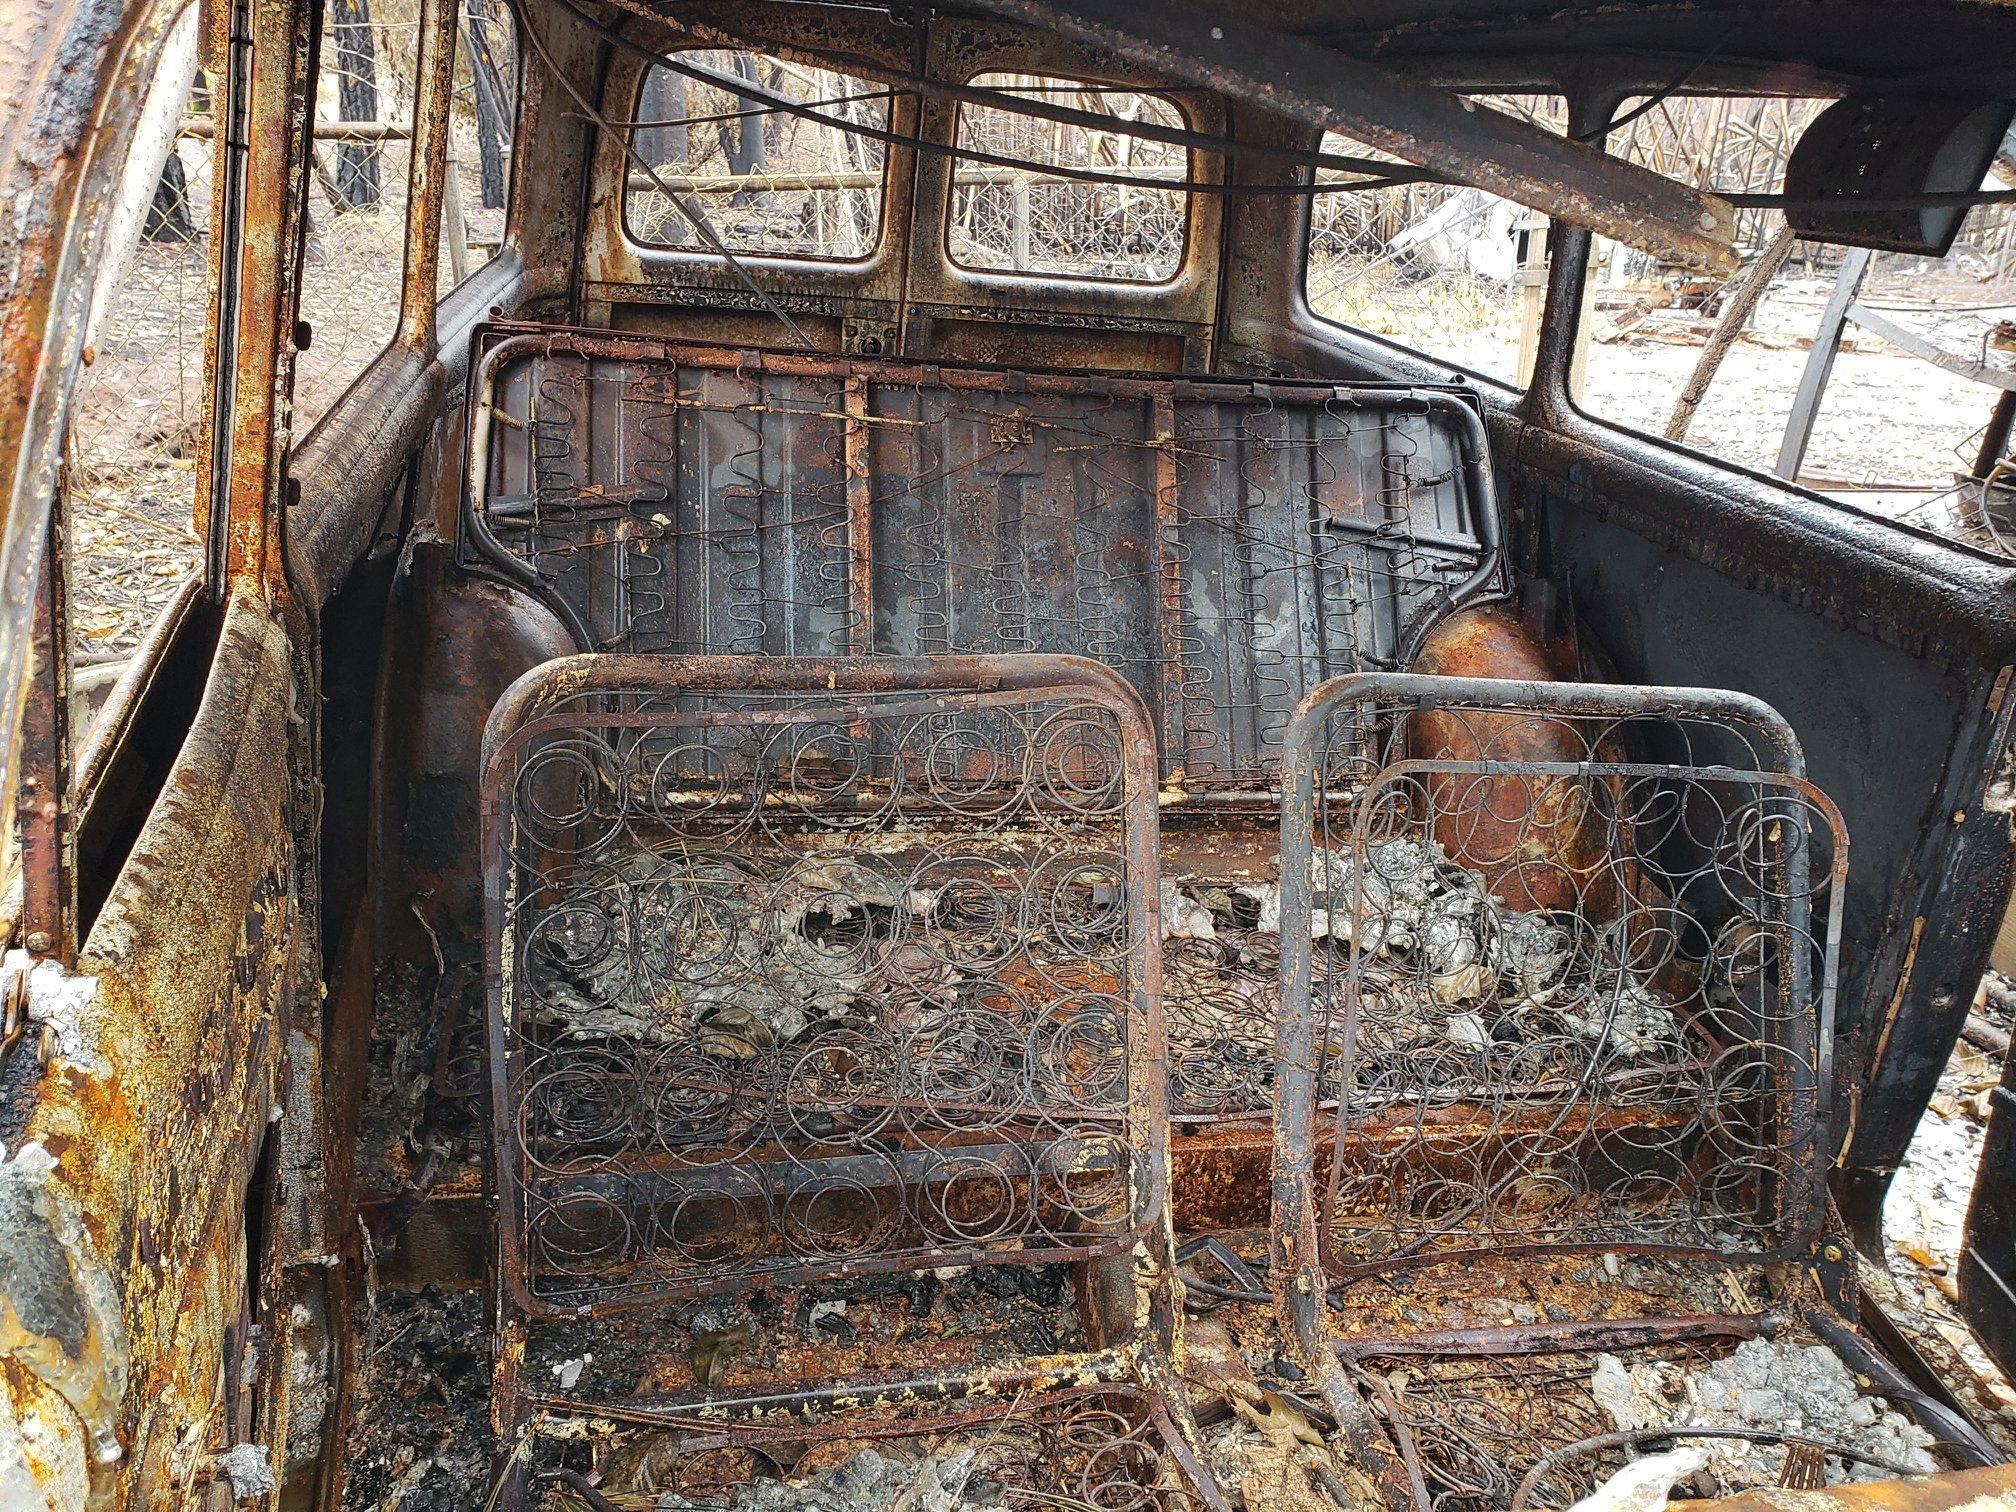 kirby family interior burned volvo